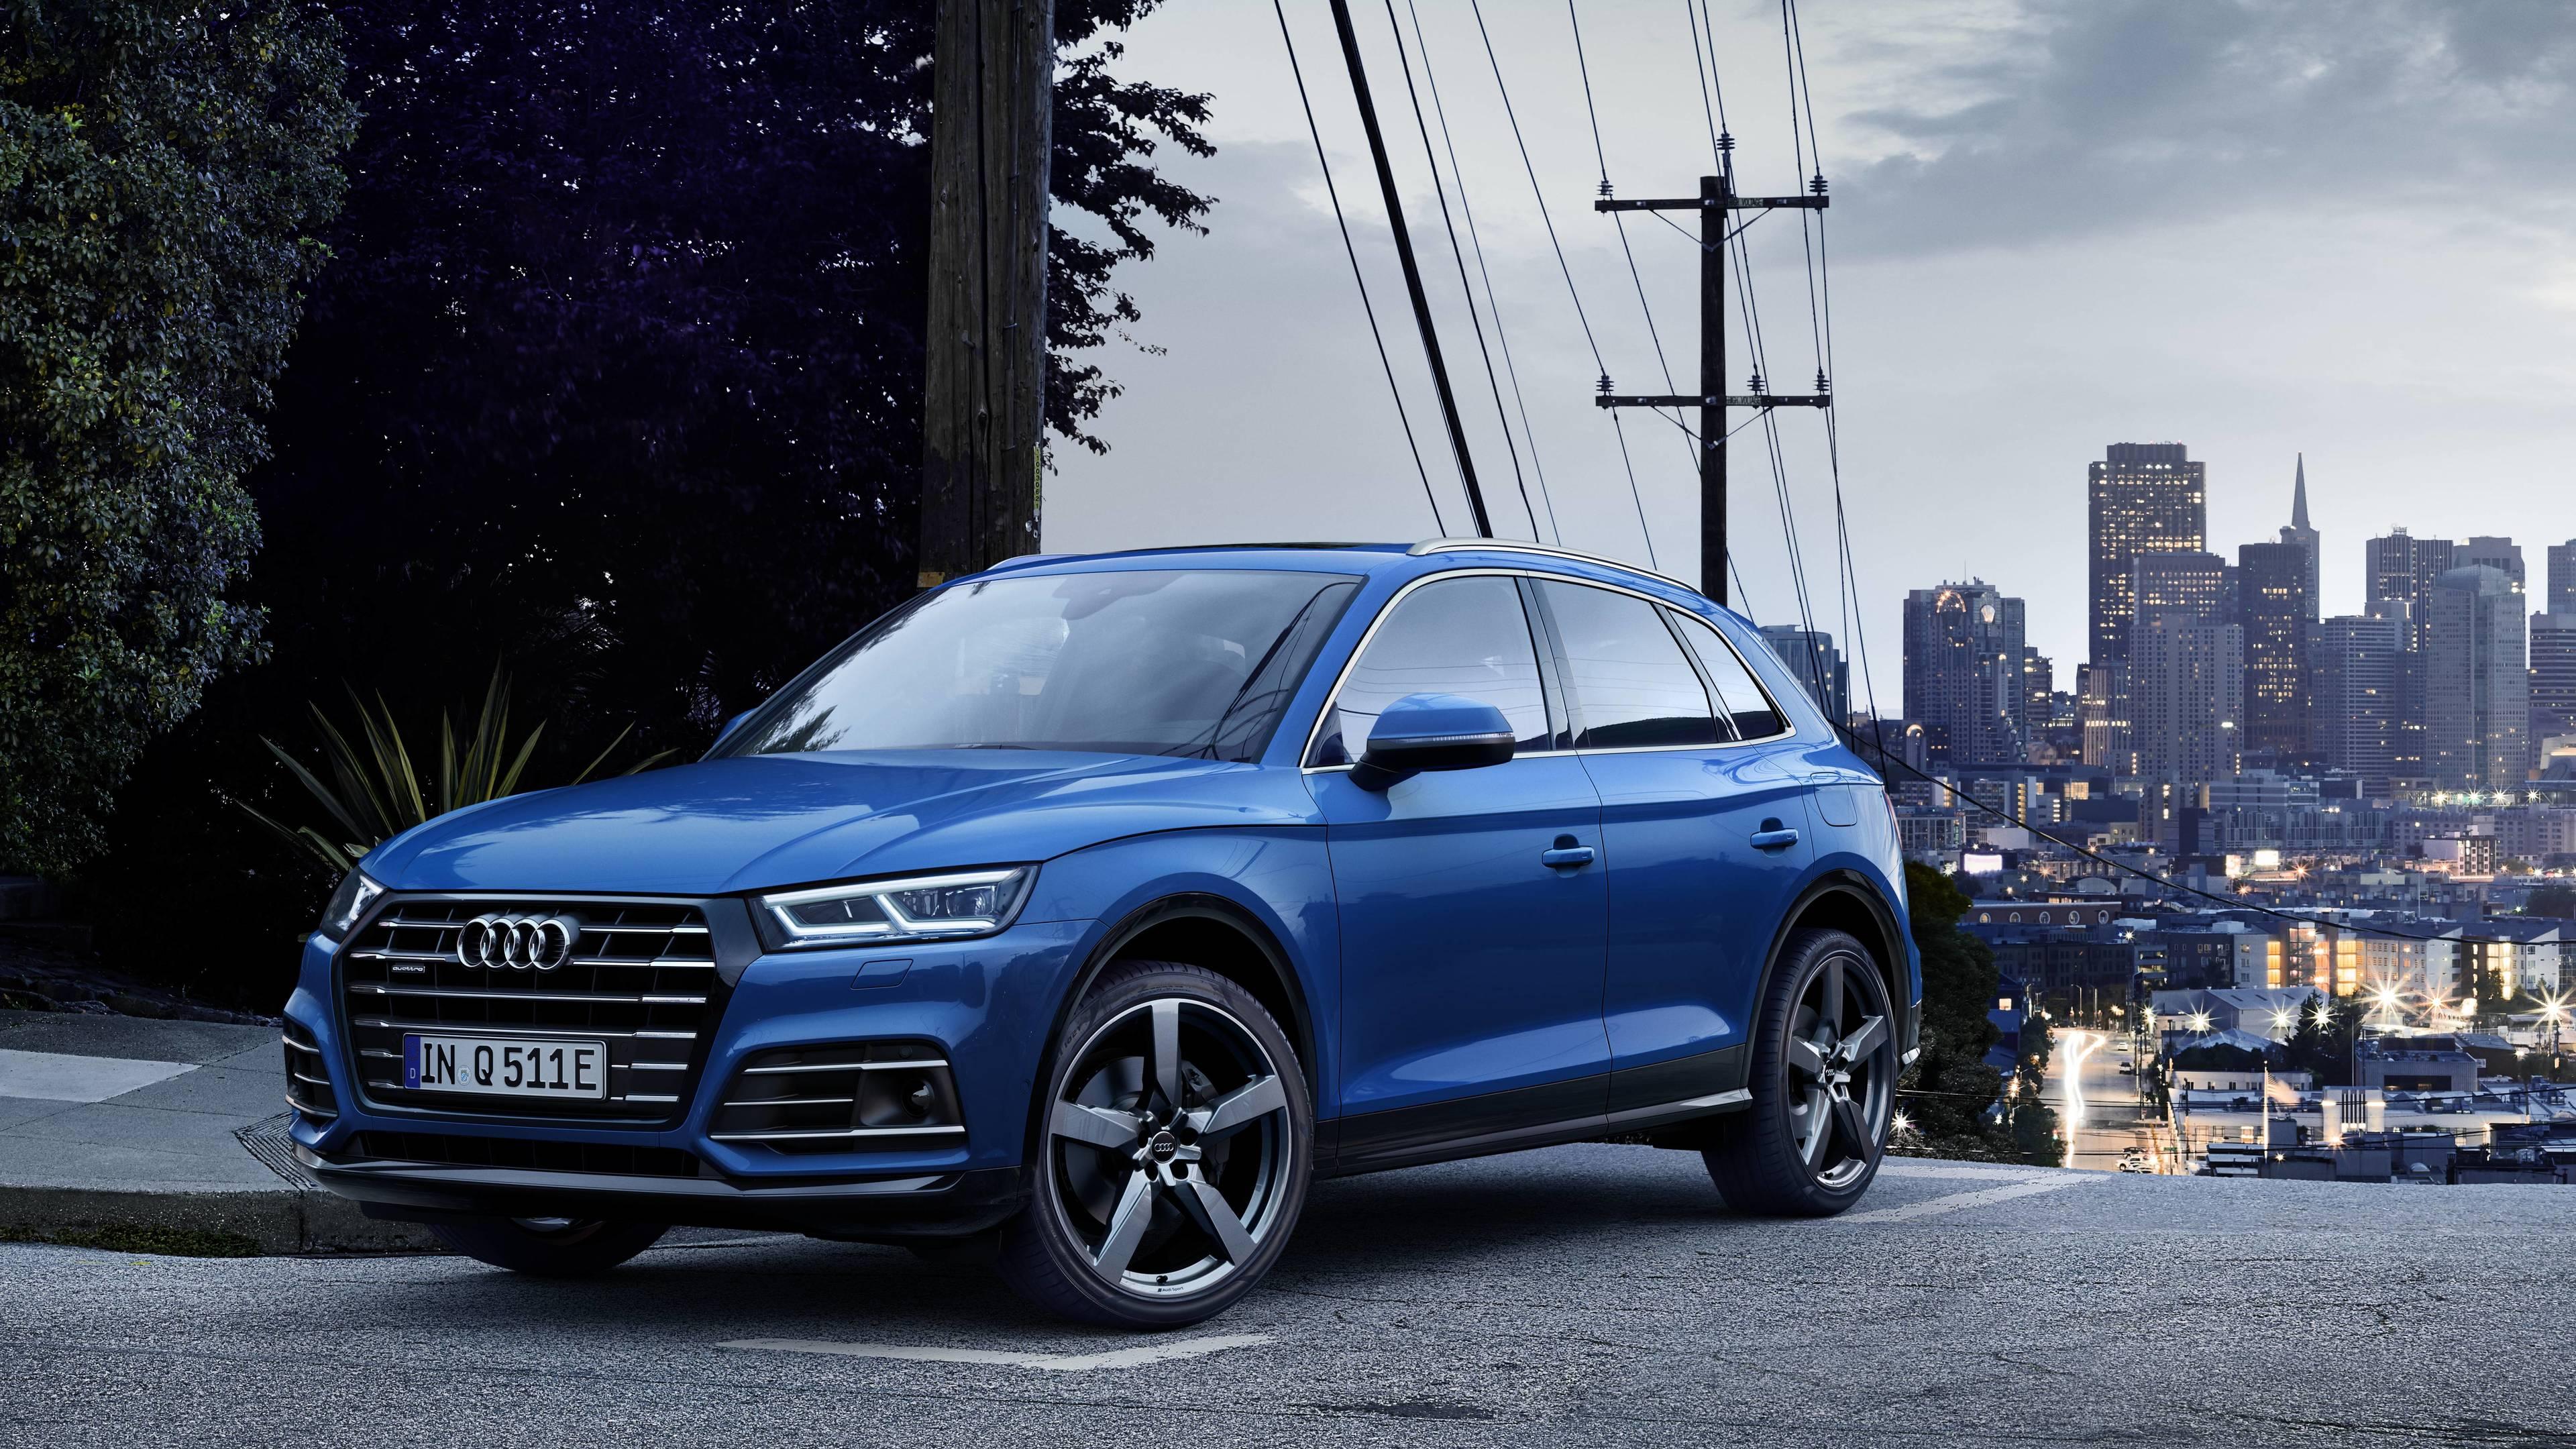 2019 audi q5 4k 1553075824 - 2019 Audi Q5 4k - hd-wallpapers, cars wallpapers, audi wallpapers, audi q5 wallpapers, 5k wallpapers, 4k-wallpapers